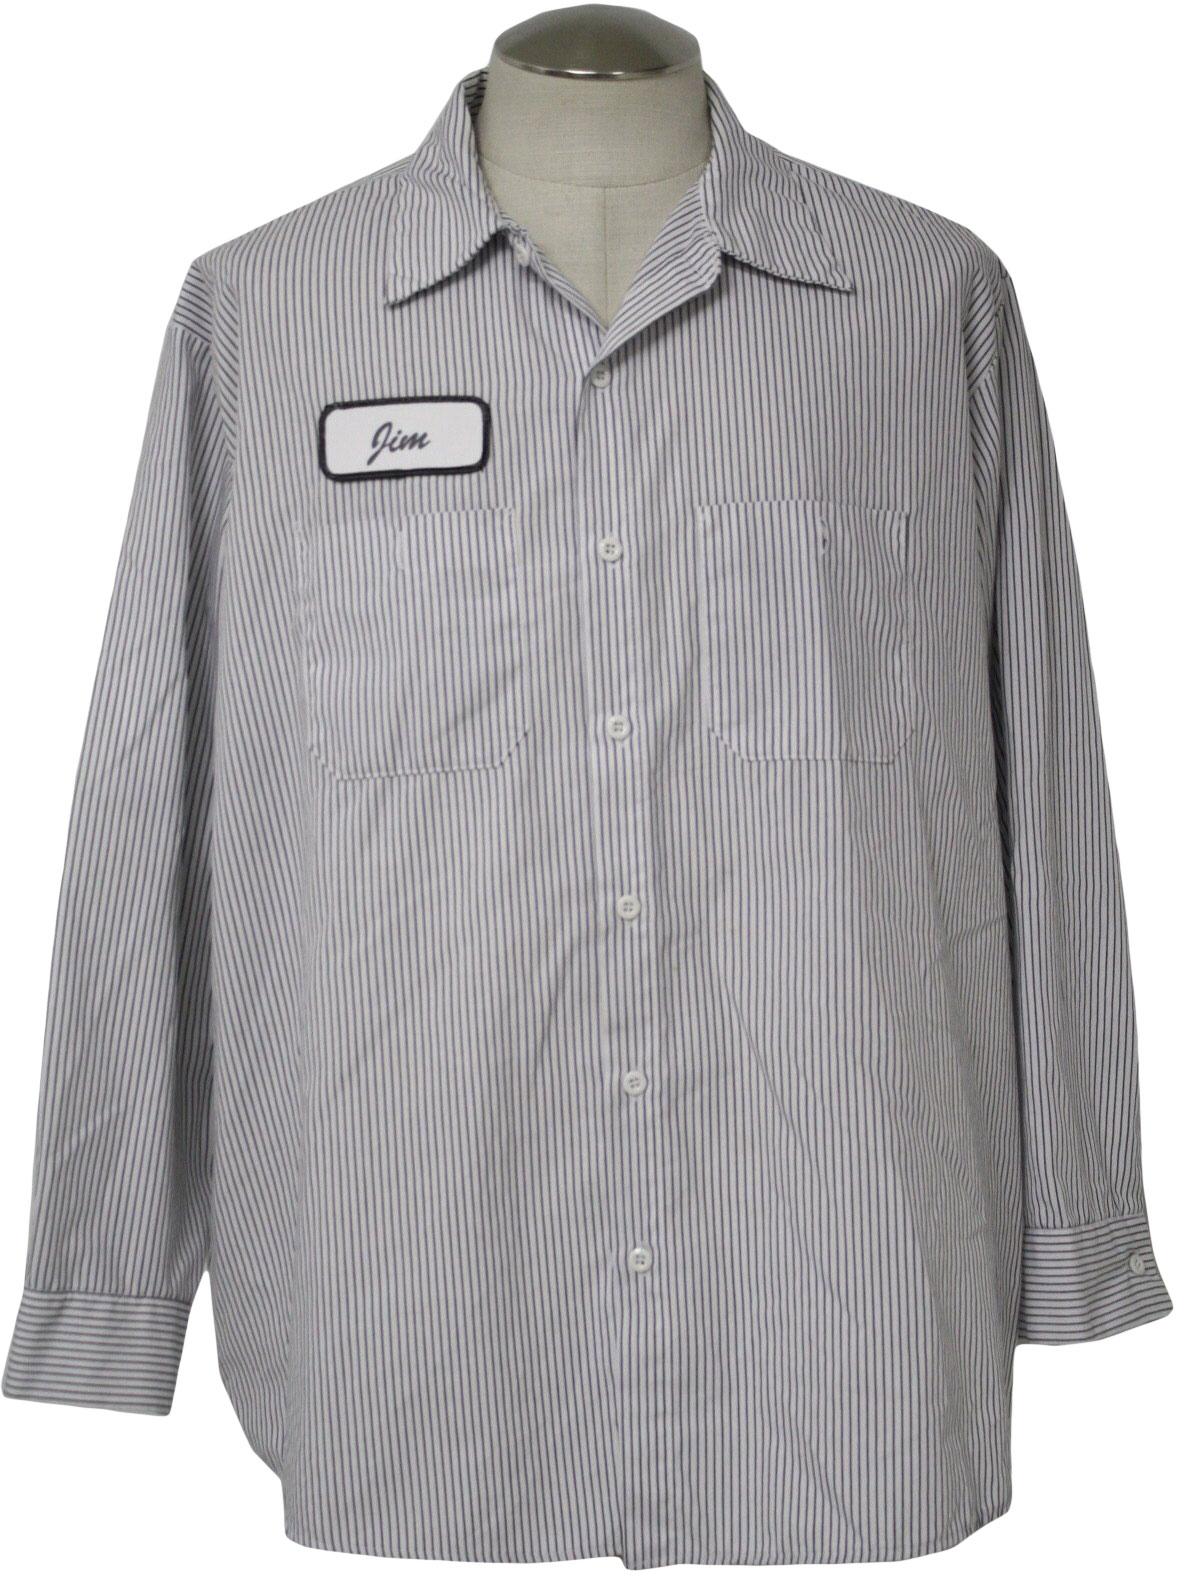 80's Vintage Shirt: 80s -Red Kap- Mens white with grey ... | 1197 x 1596 jpeg 311kB